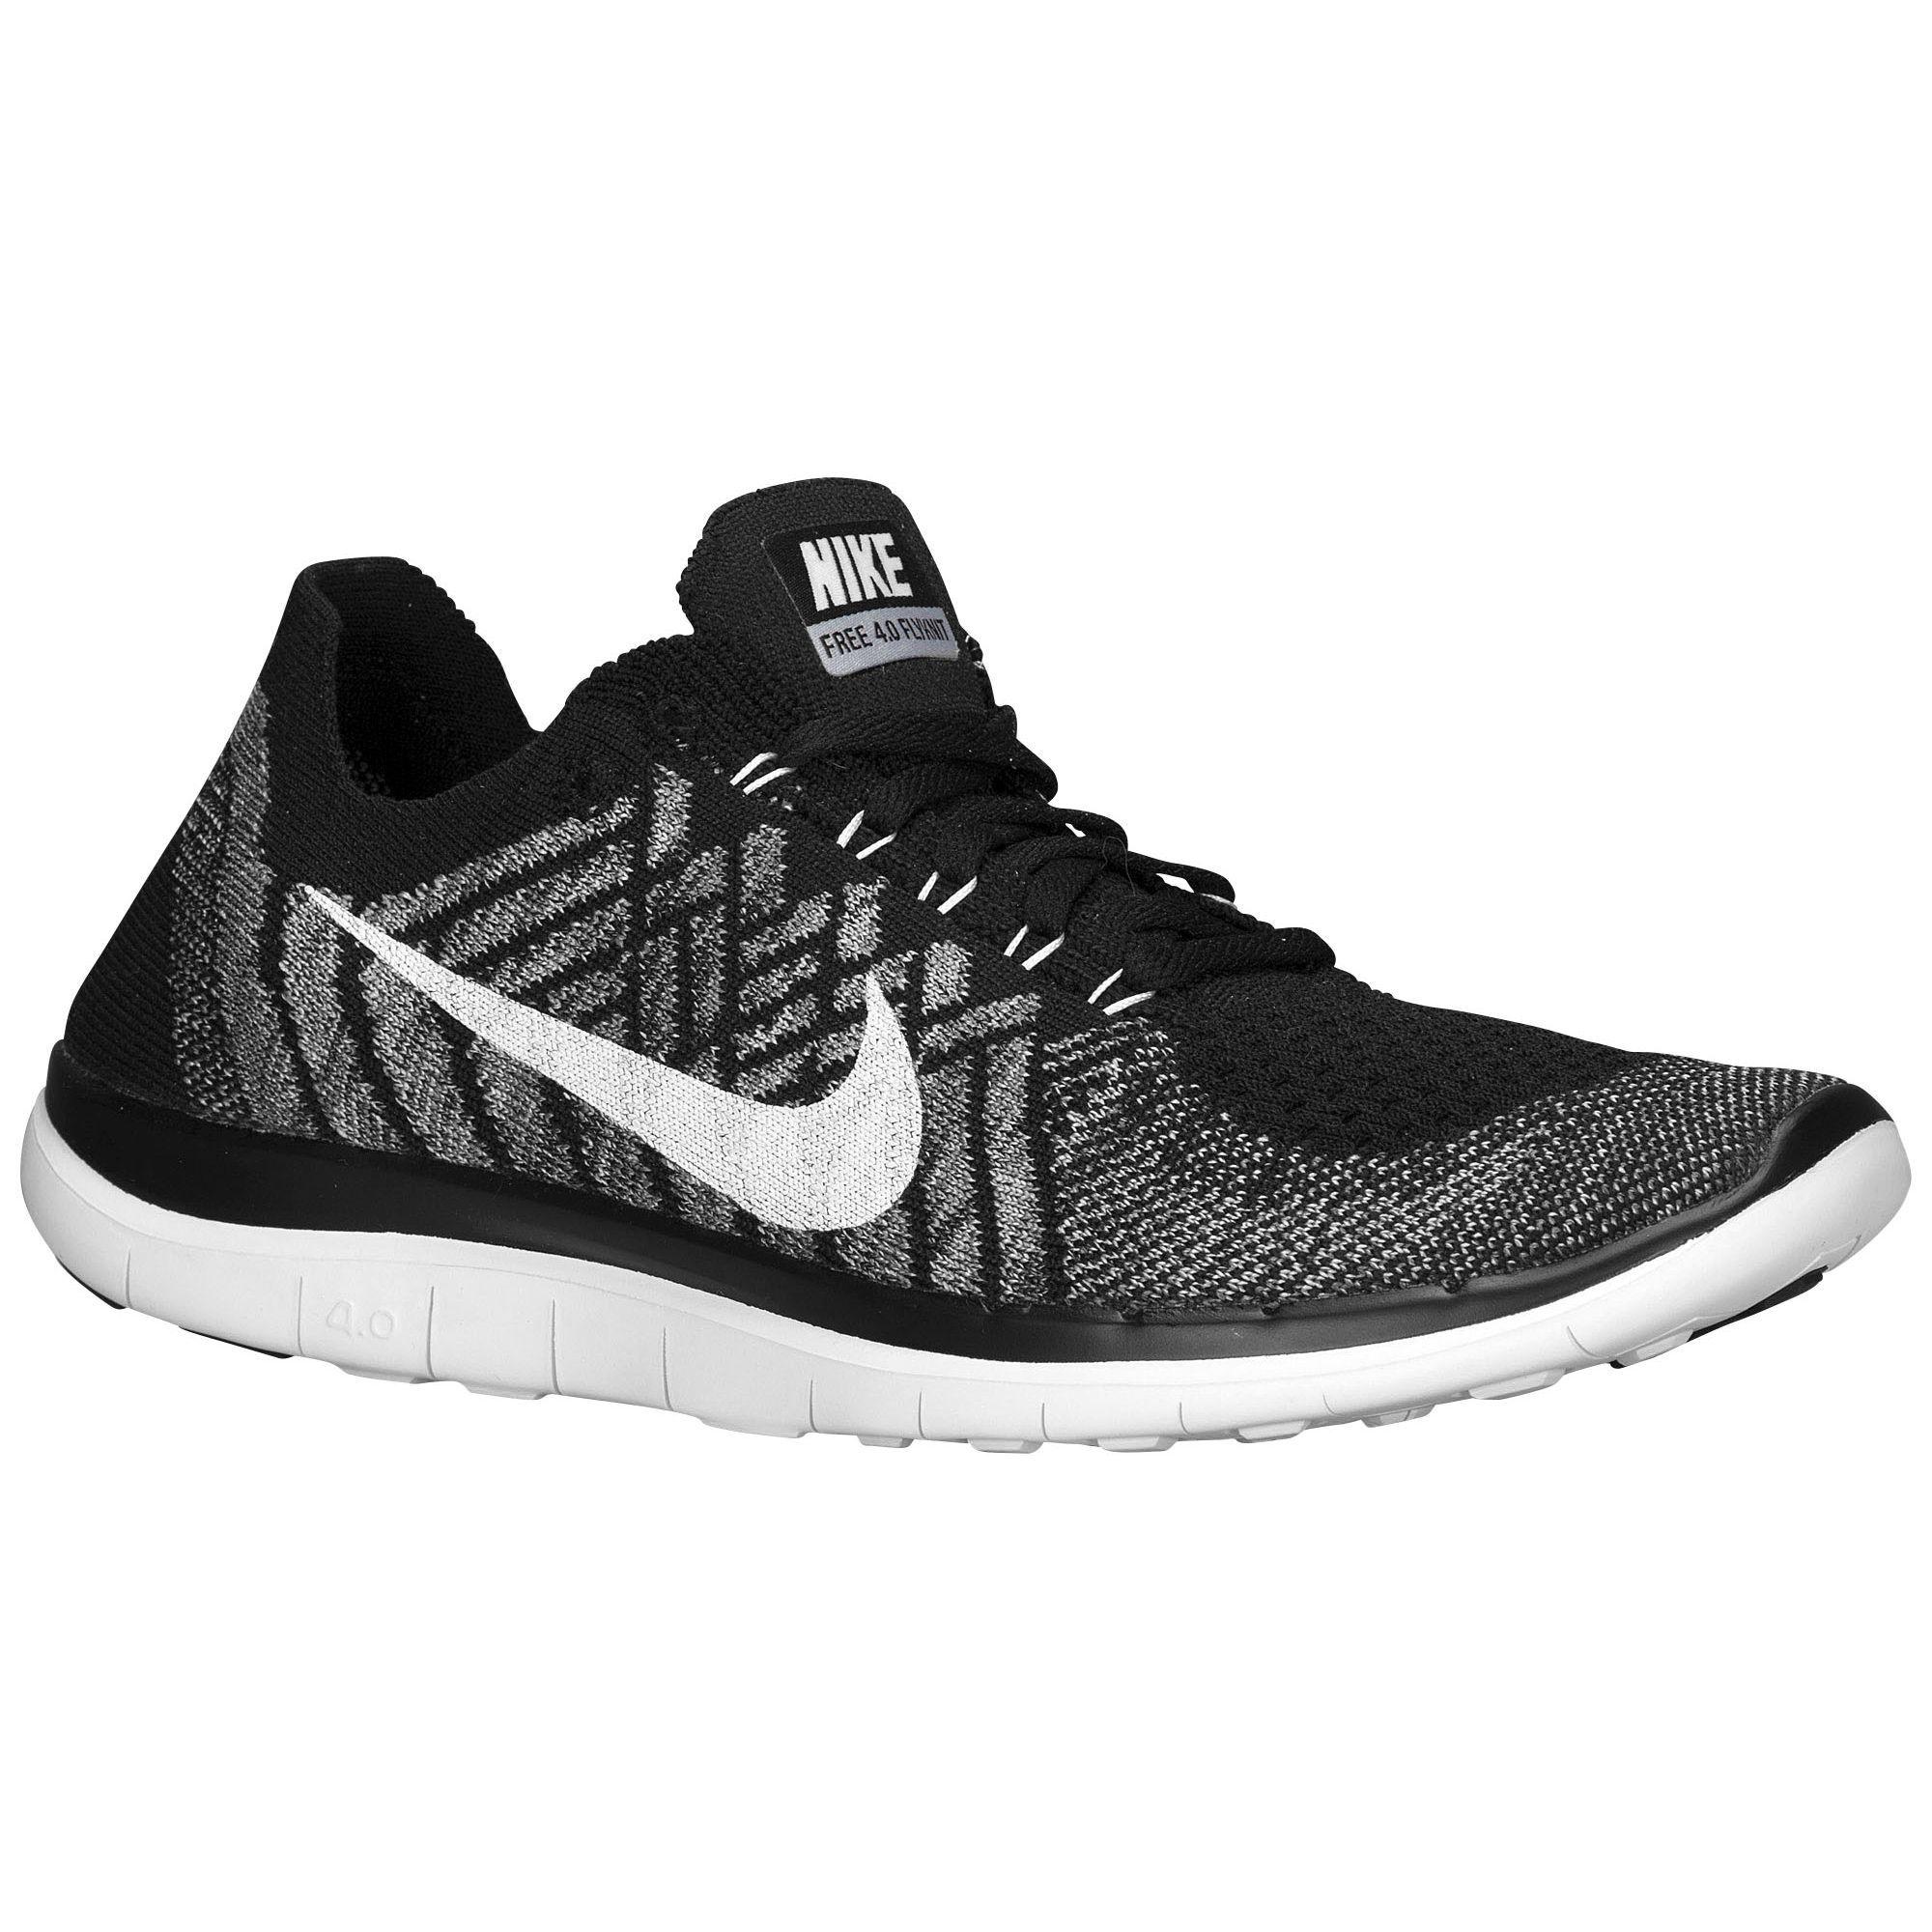 7307c530b309f denmark nike free 4.0 flyknit 2015 womens running shoes black wolf grey  dark grey white a362e